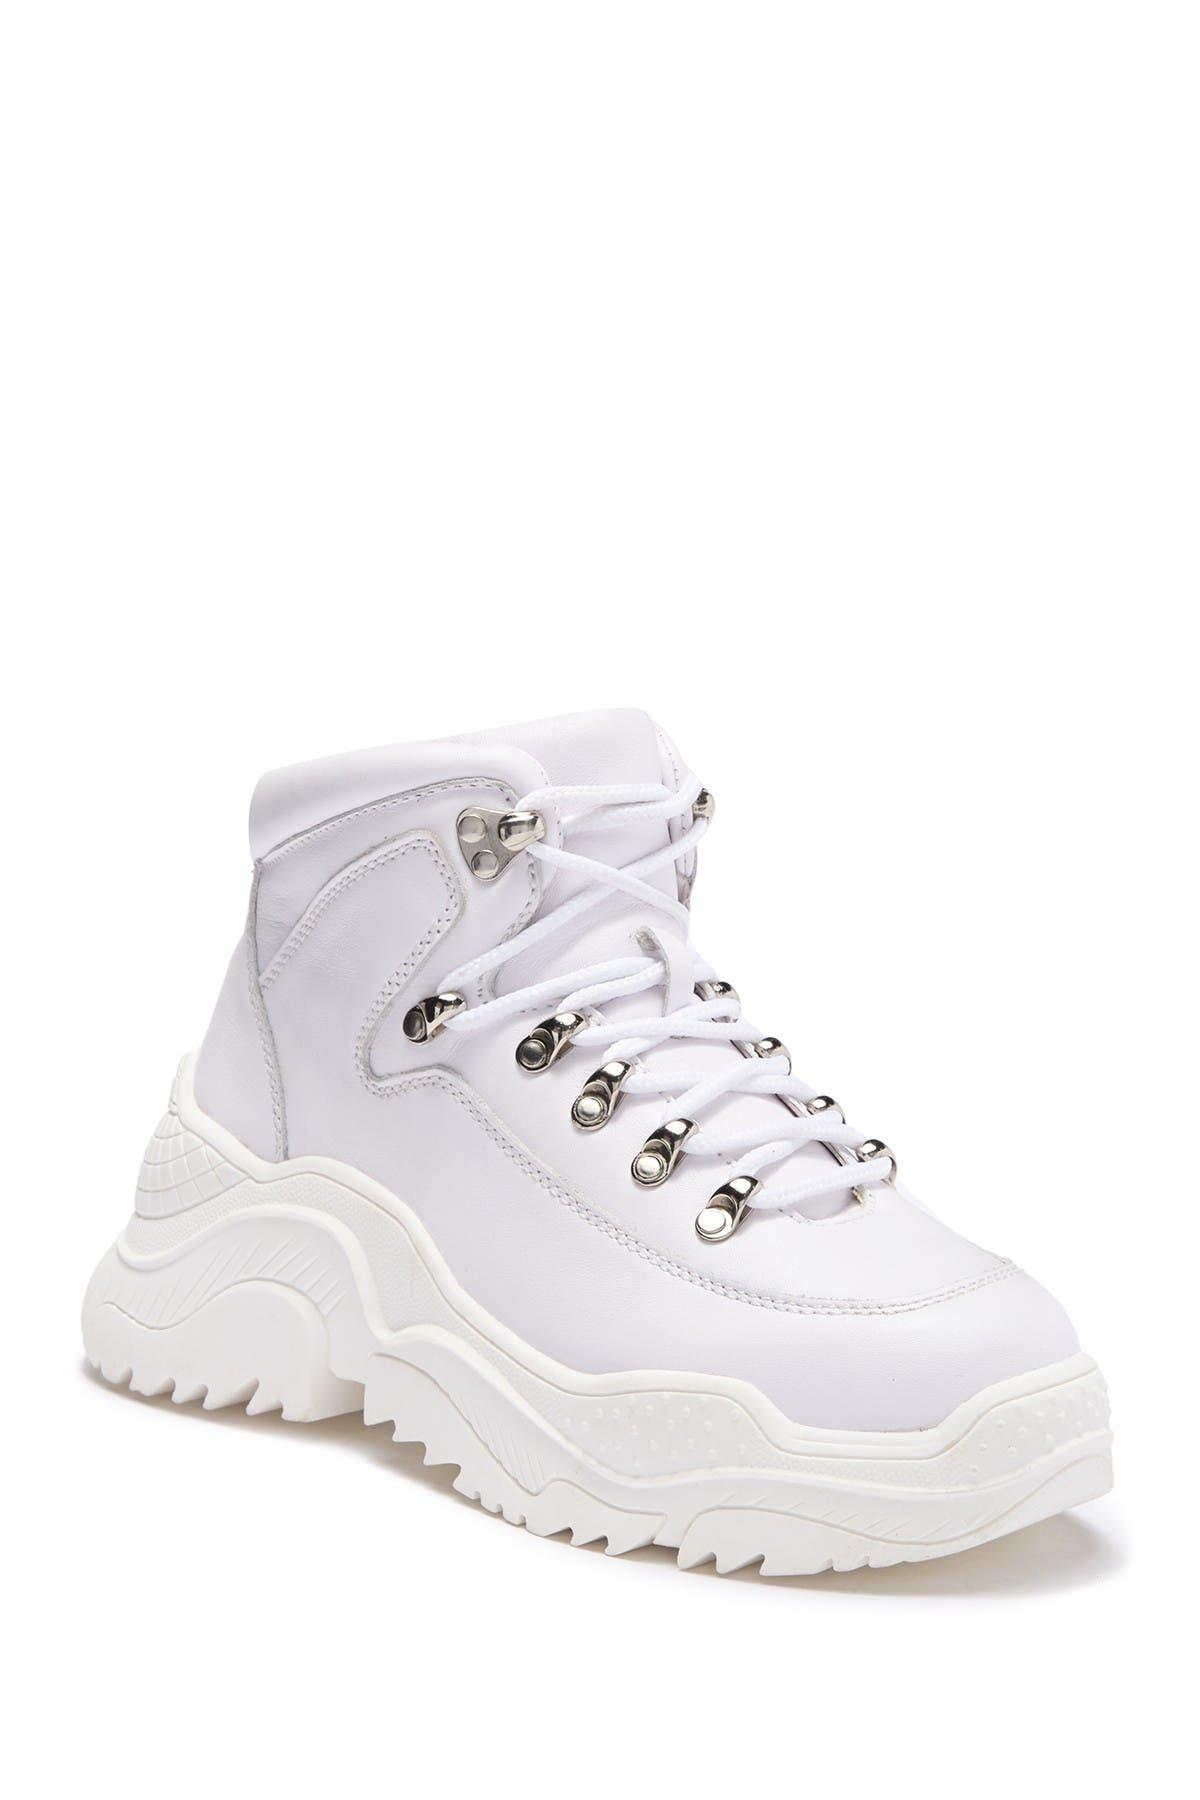 Jeffrey Campbell | Debris Sneaker Boot